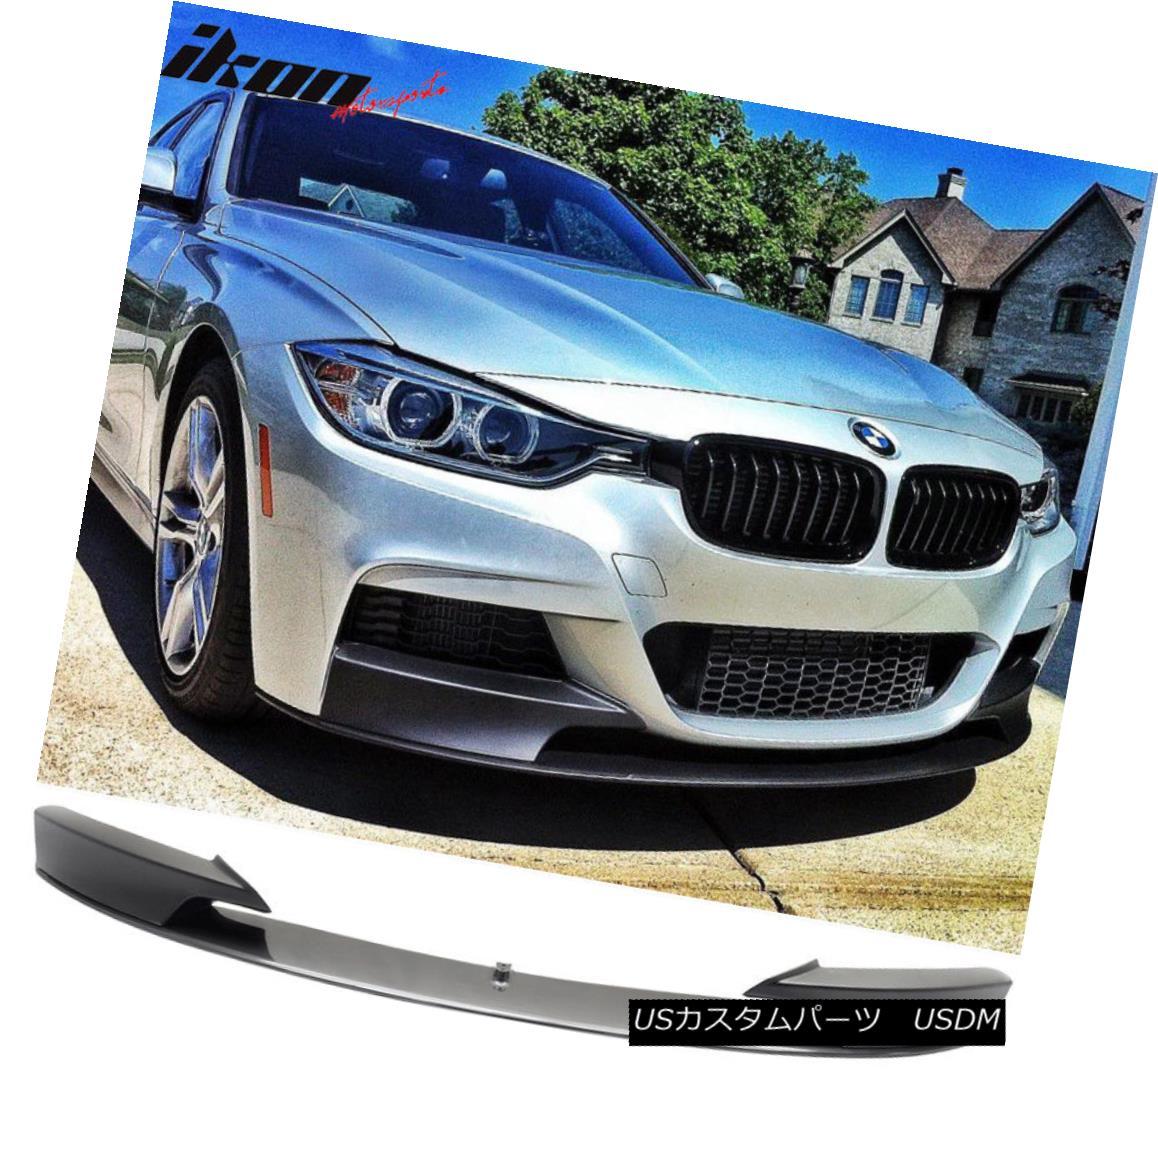 【5%OFF】 エアロパーツ #B39 Fits 12-18 Performance F30 Performance Front Bumper Bumper Lip Painted Mineral Gray Metallic #B39 フィット12-18 F30パフォーマンスフロントバンパーリップペイントミネラルグレーメタリック#B39, サンニュートリション株式会社:5813946b --- pavlekovic.hr